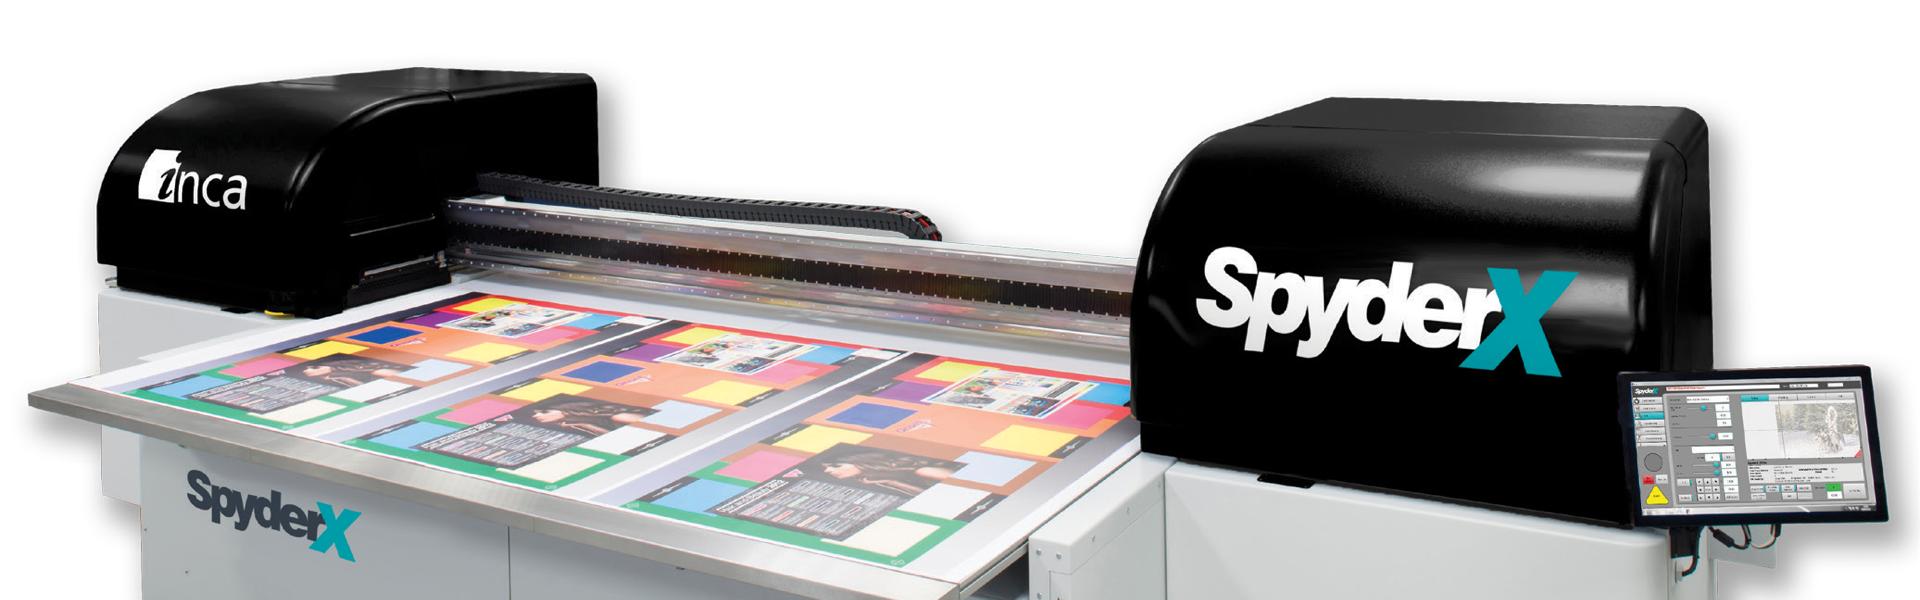 SpyderX Printer